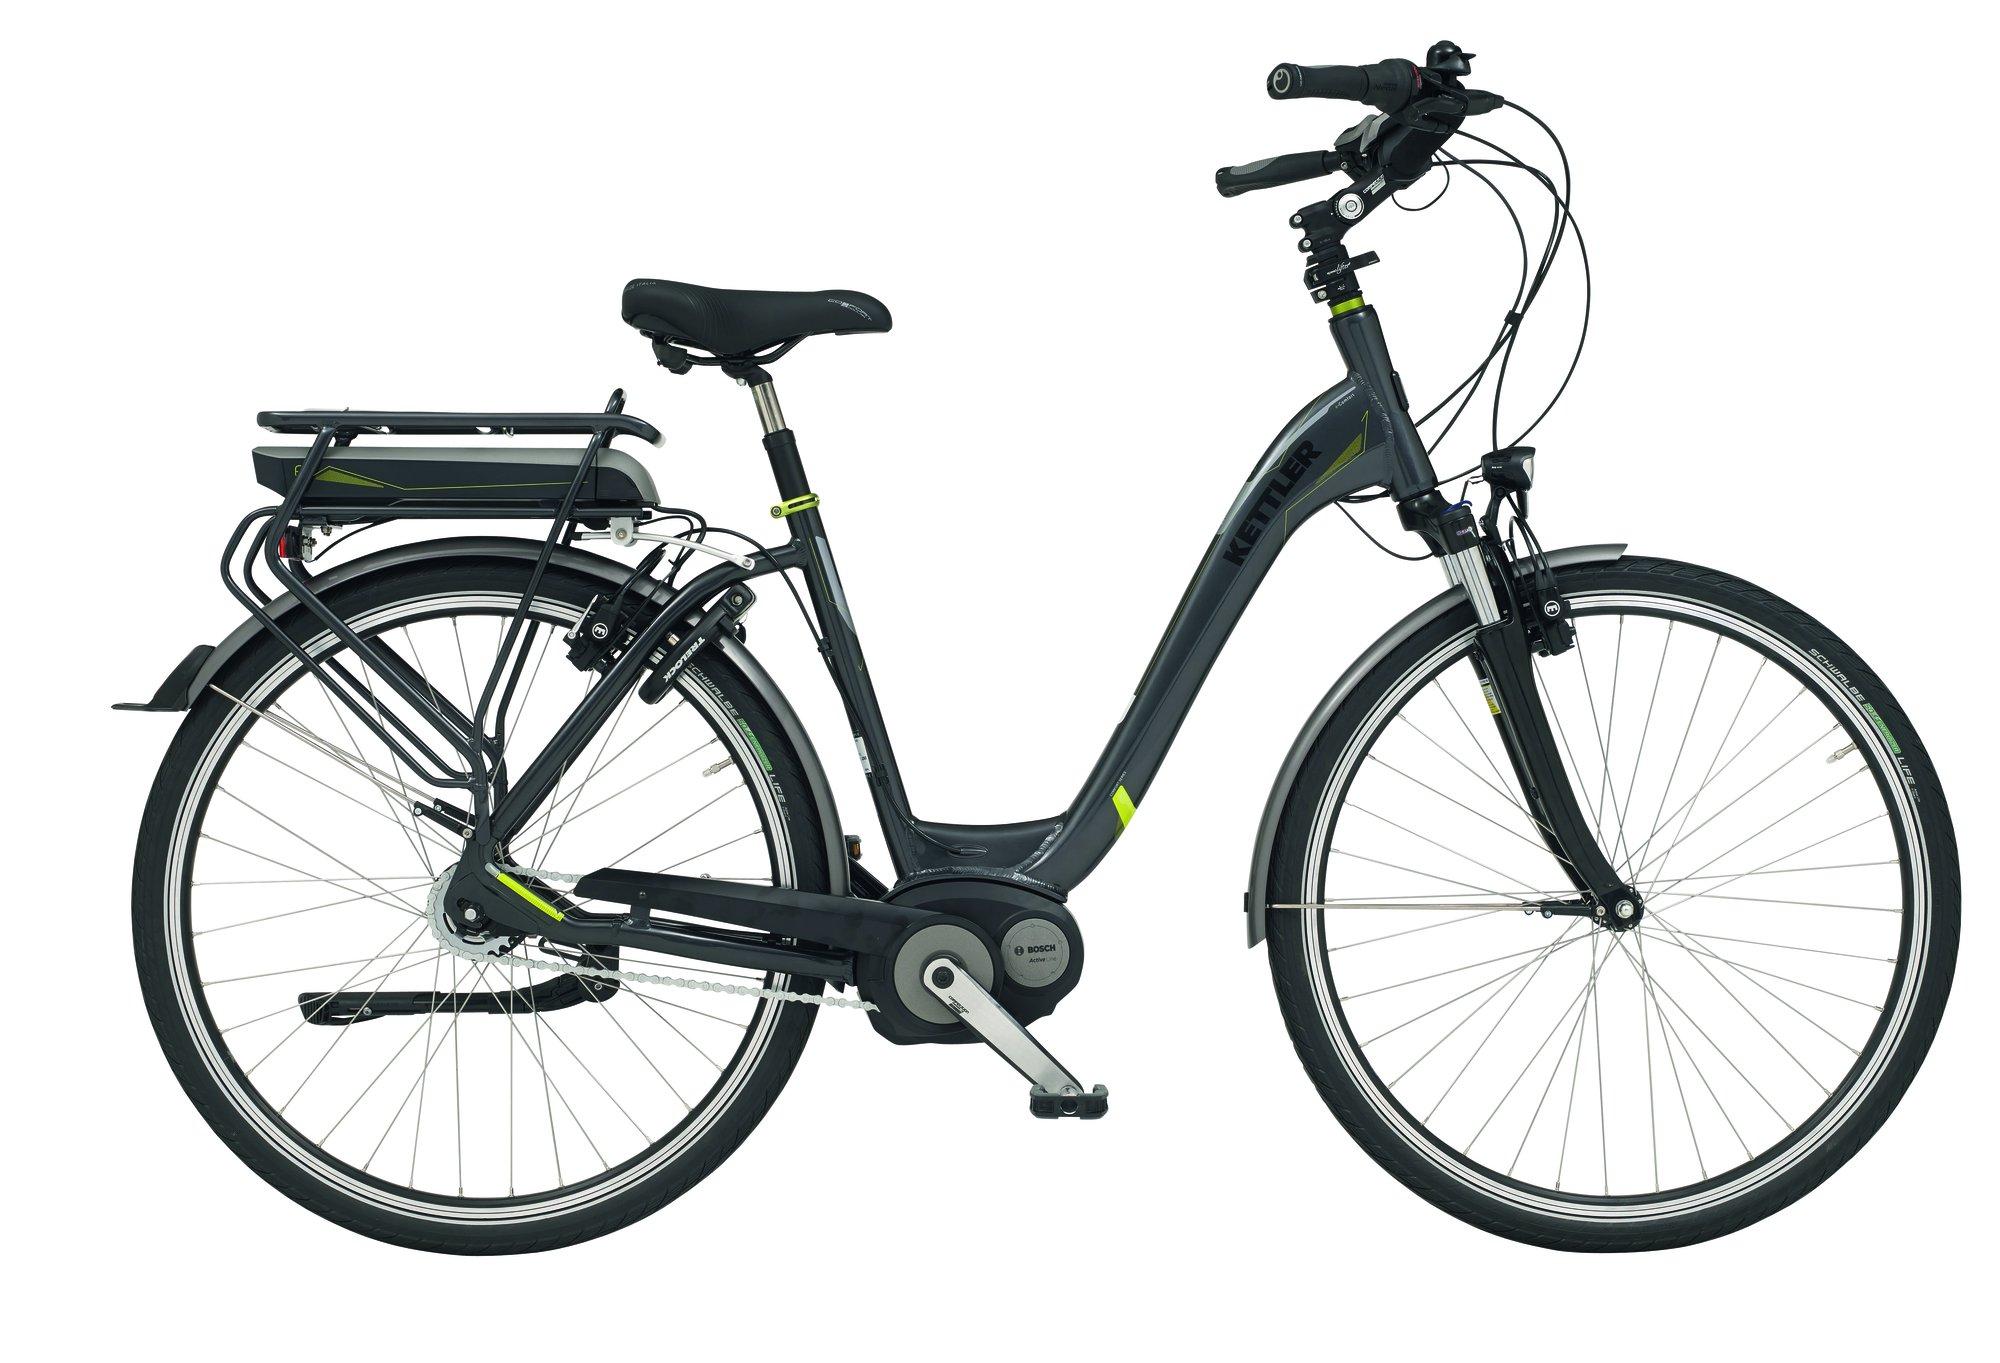 selle bassano modular sattel ersatzteile zu dem fahrrad. Black Bedroom Furniture Sets. Home Design Ideas